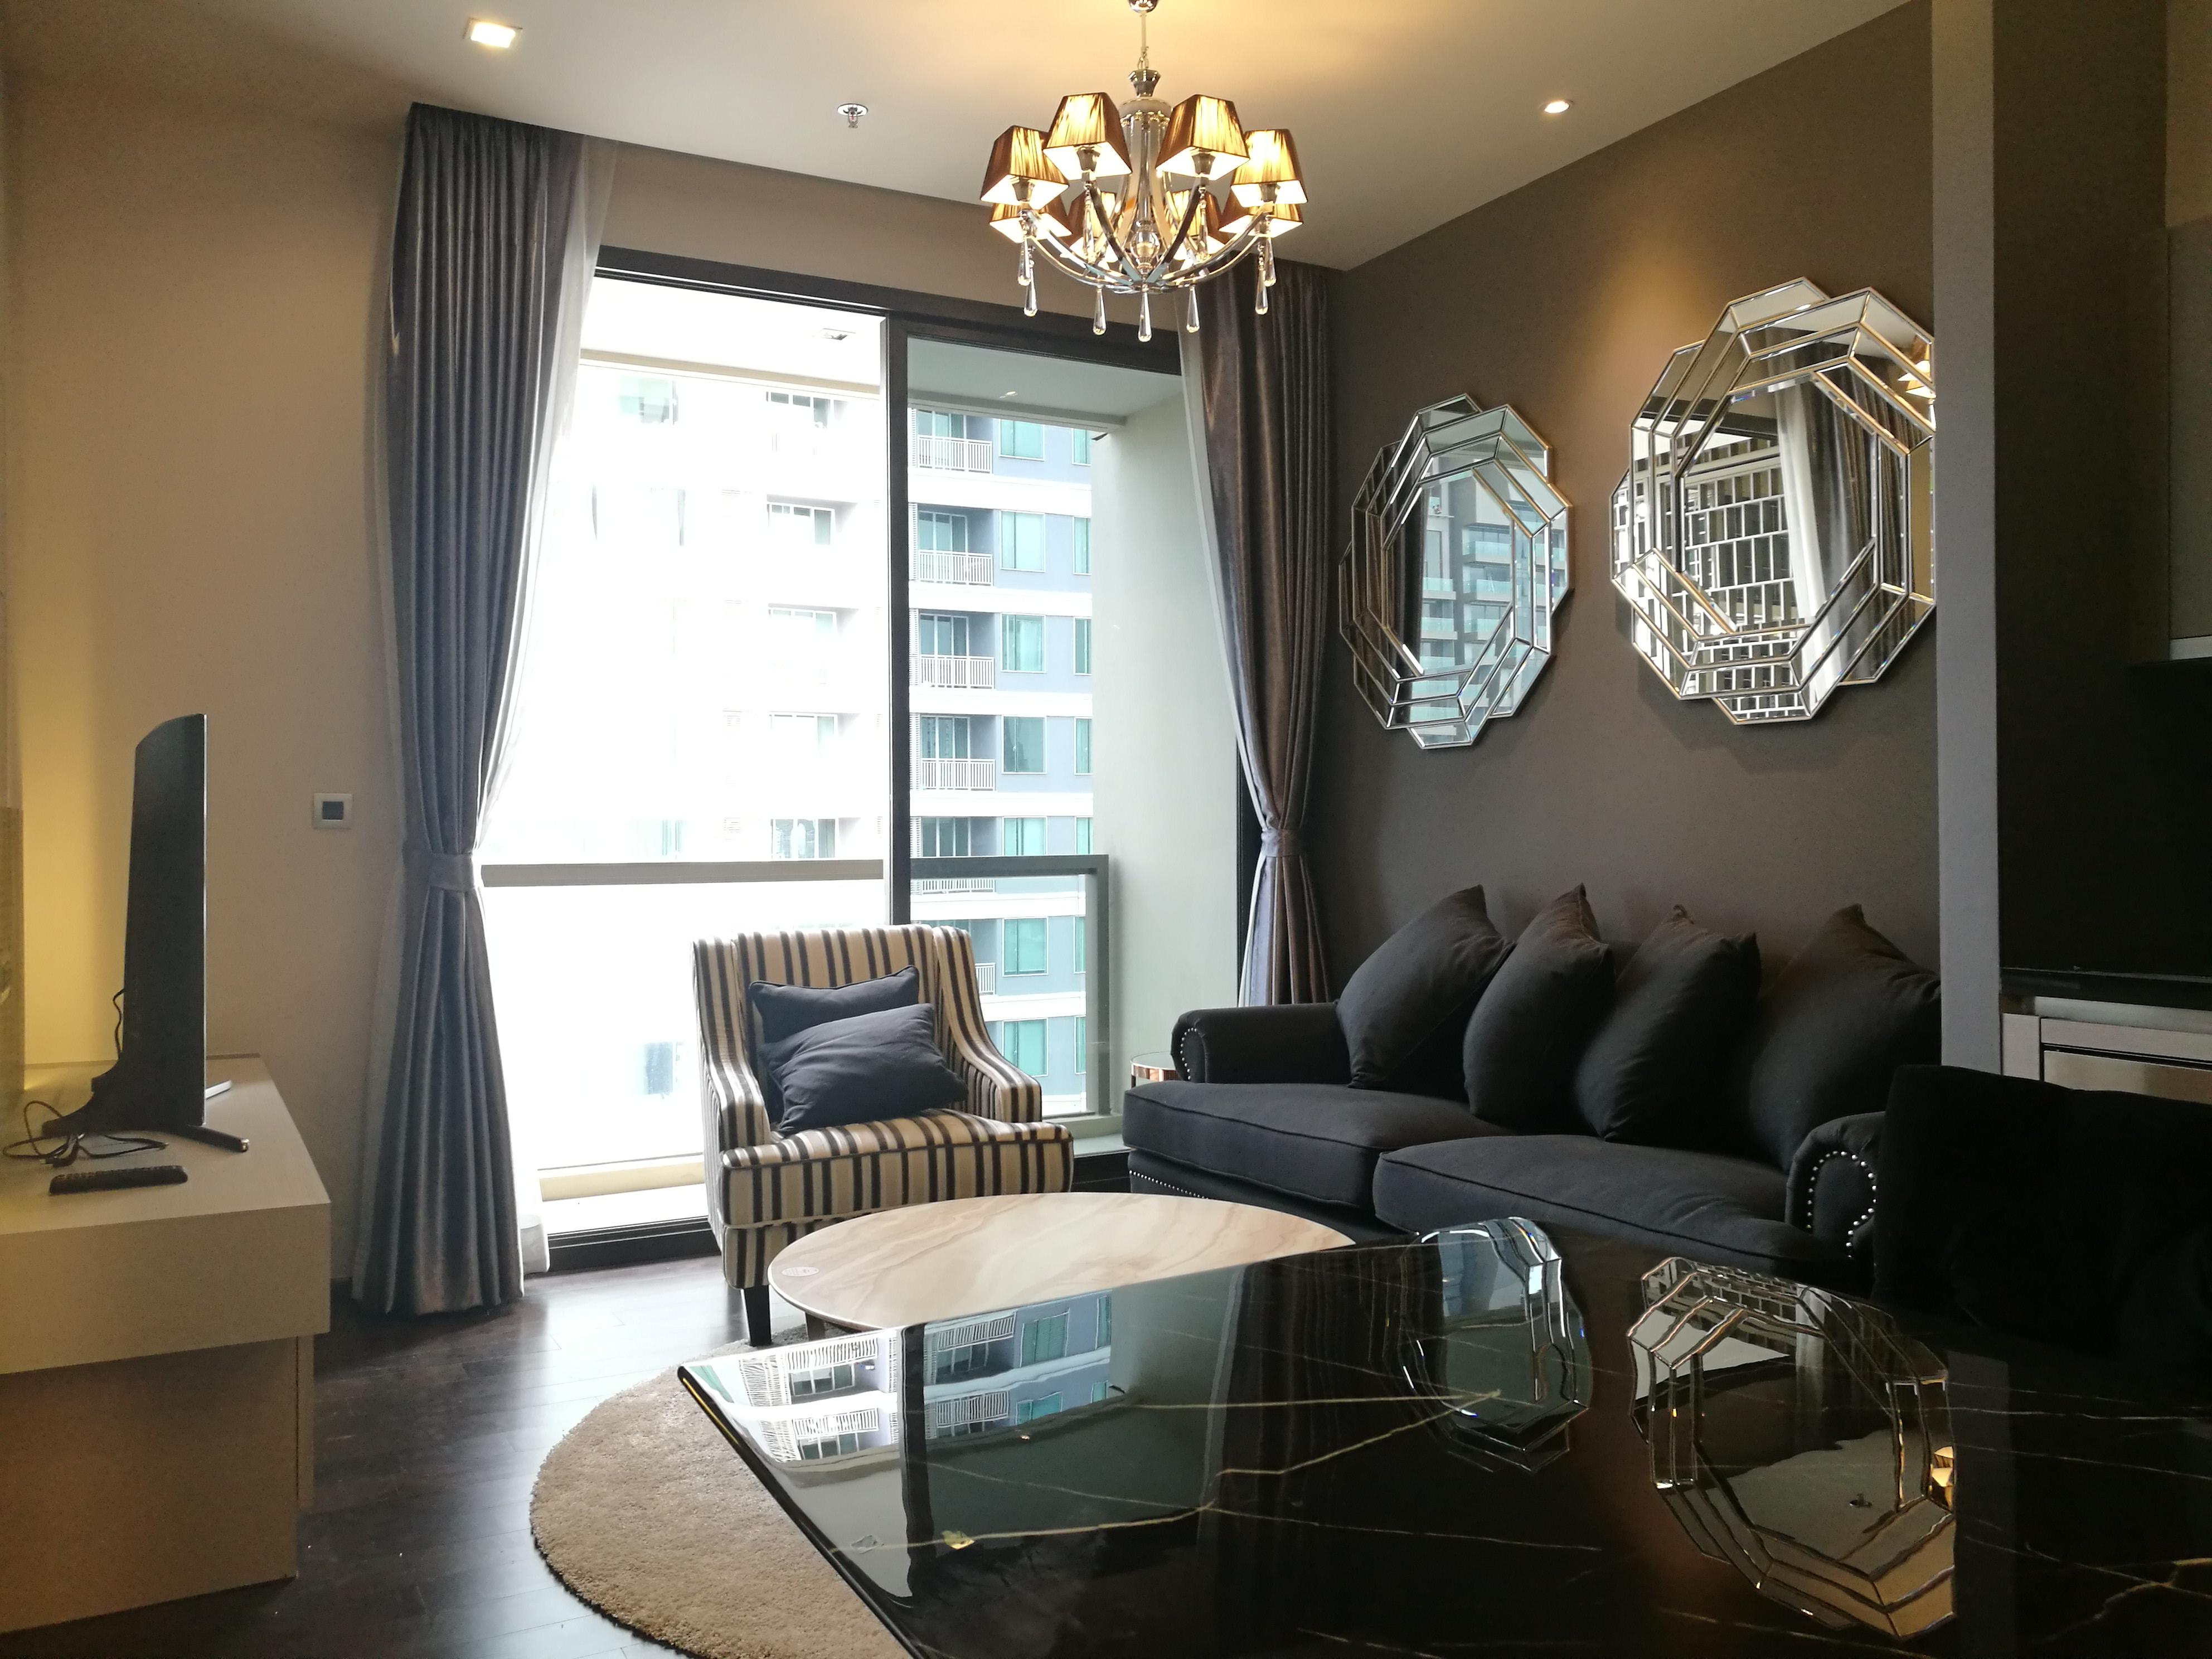 XXIX by Sansiri 2 Bedroom Unit For Rent (Next to EmQuartier)